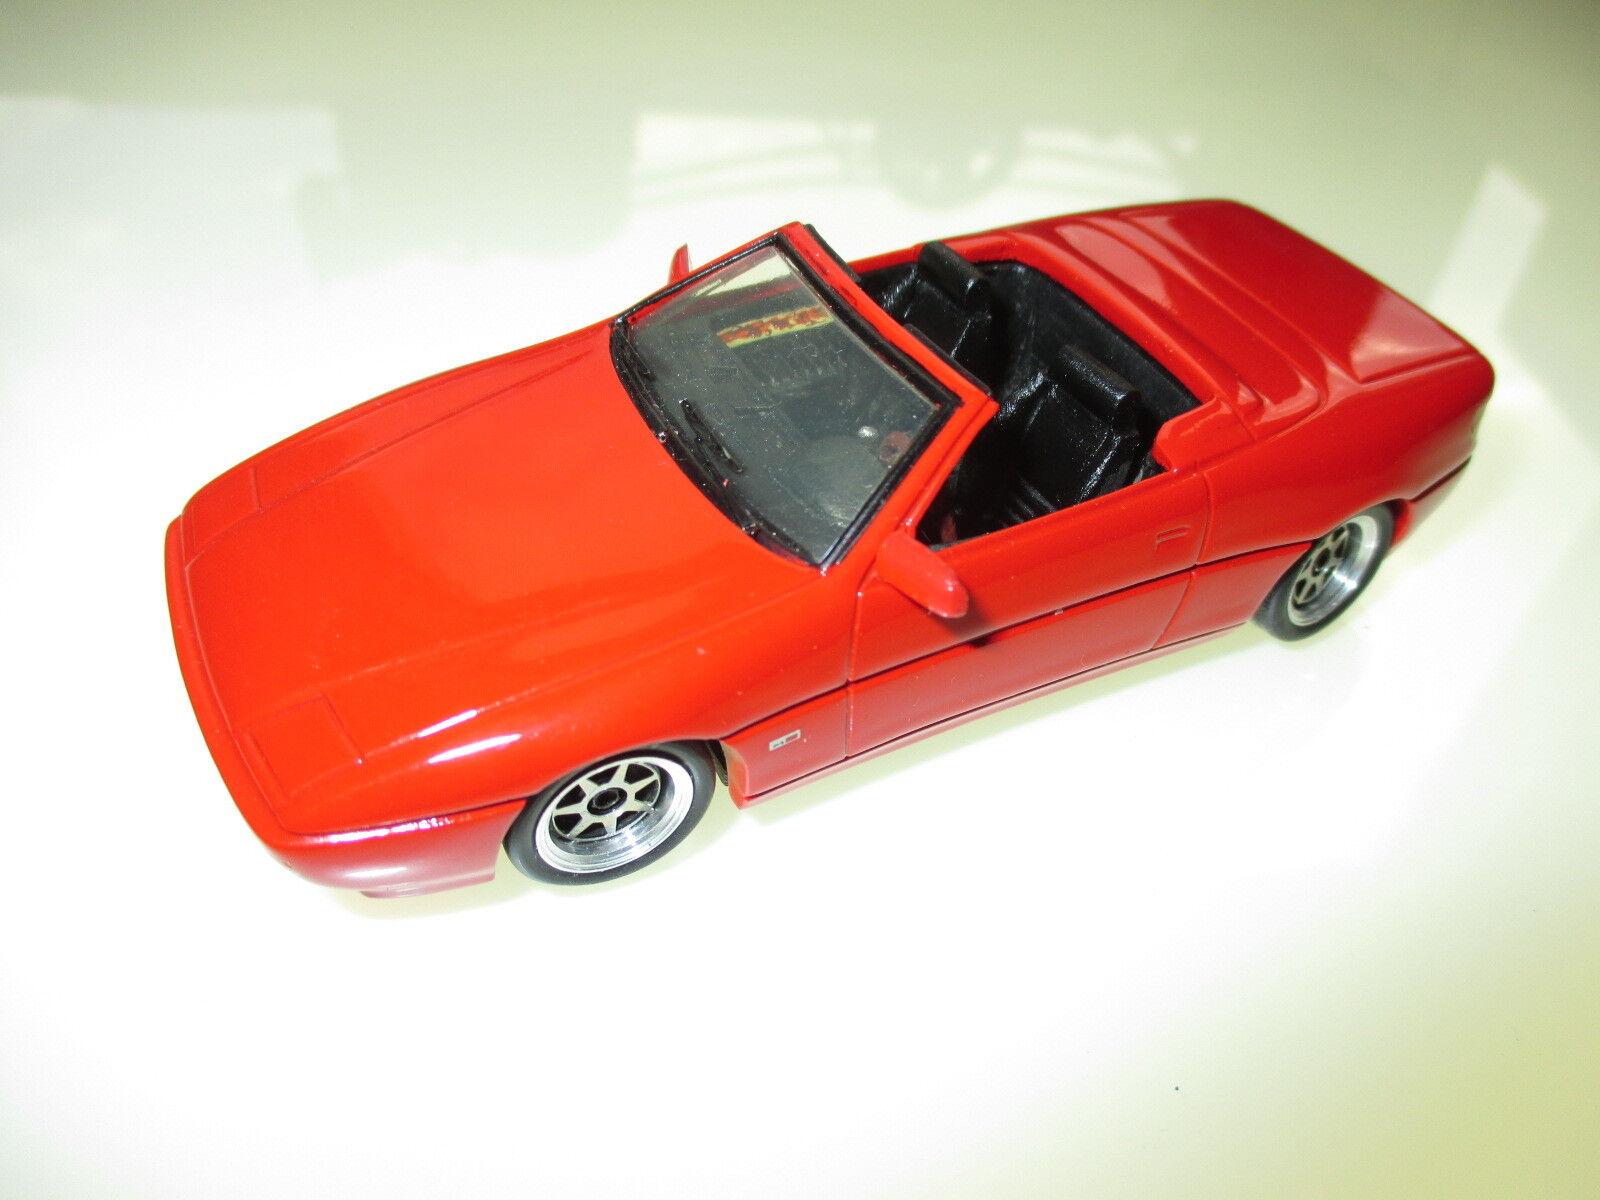 Maserati Spider OPAC 1993 in Rouge rouge, Alezan Ducleux à la main handmade 1 43